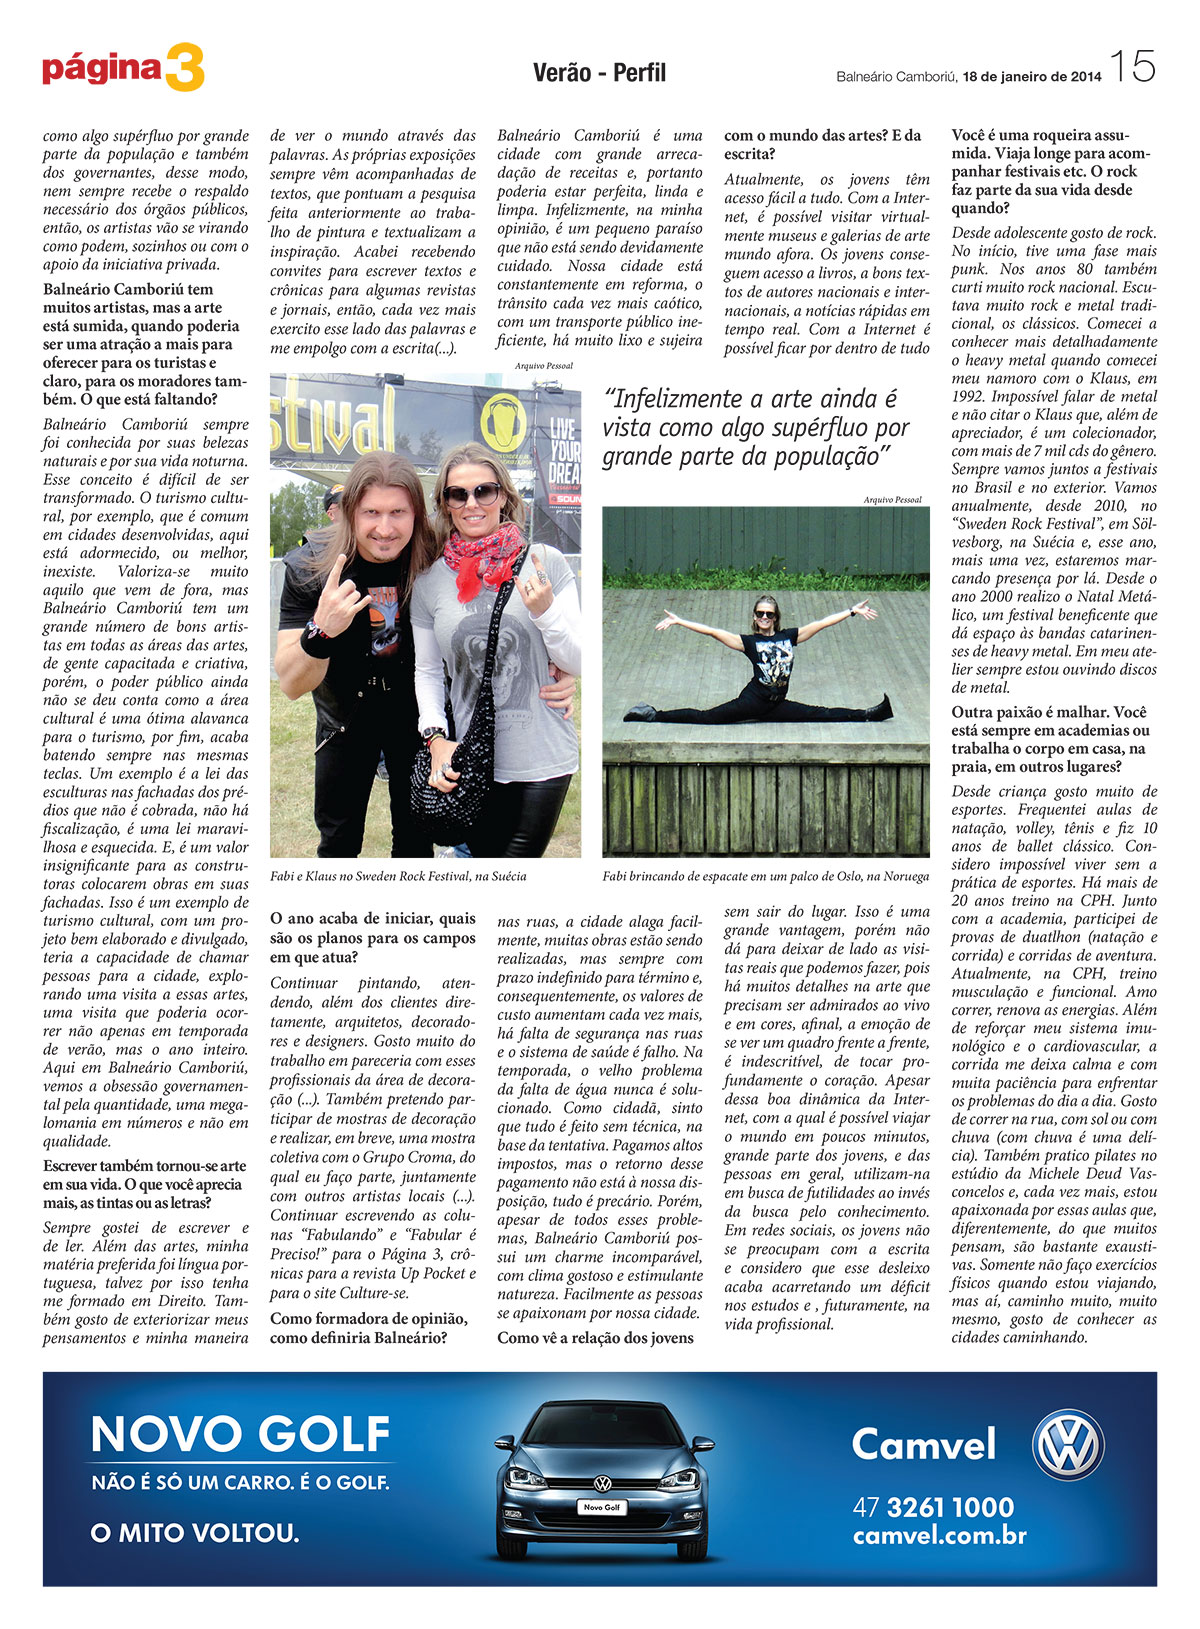 Jornal-Página-3---Perfil-com-Fabiana-Langaro-Loos---pág-15